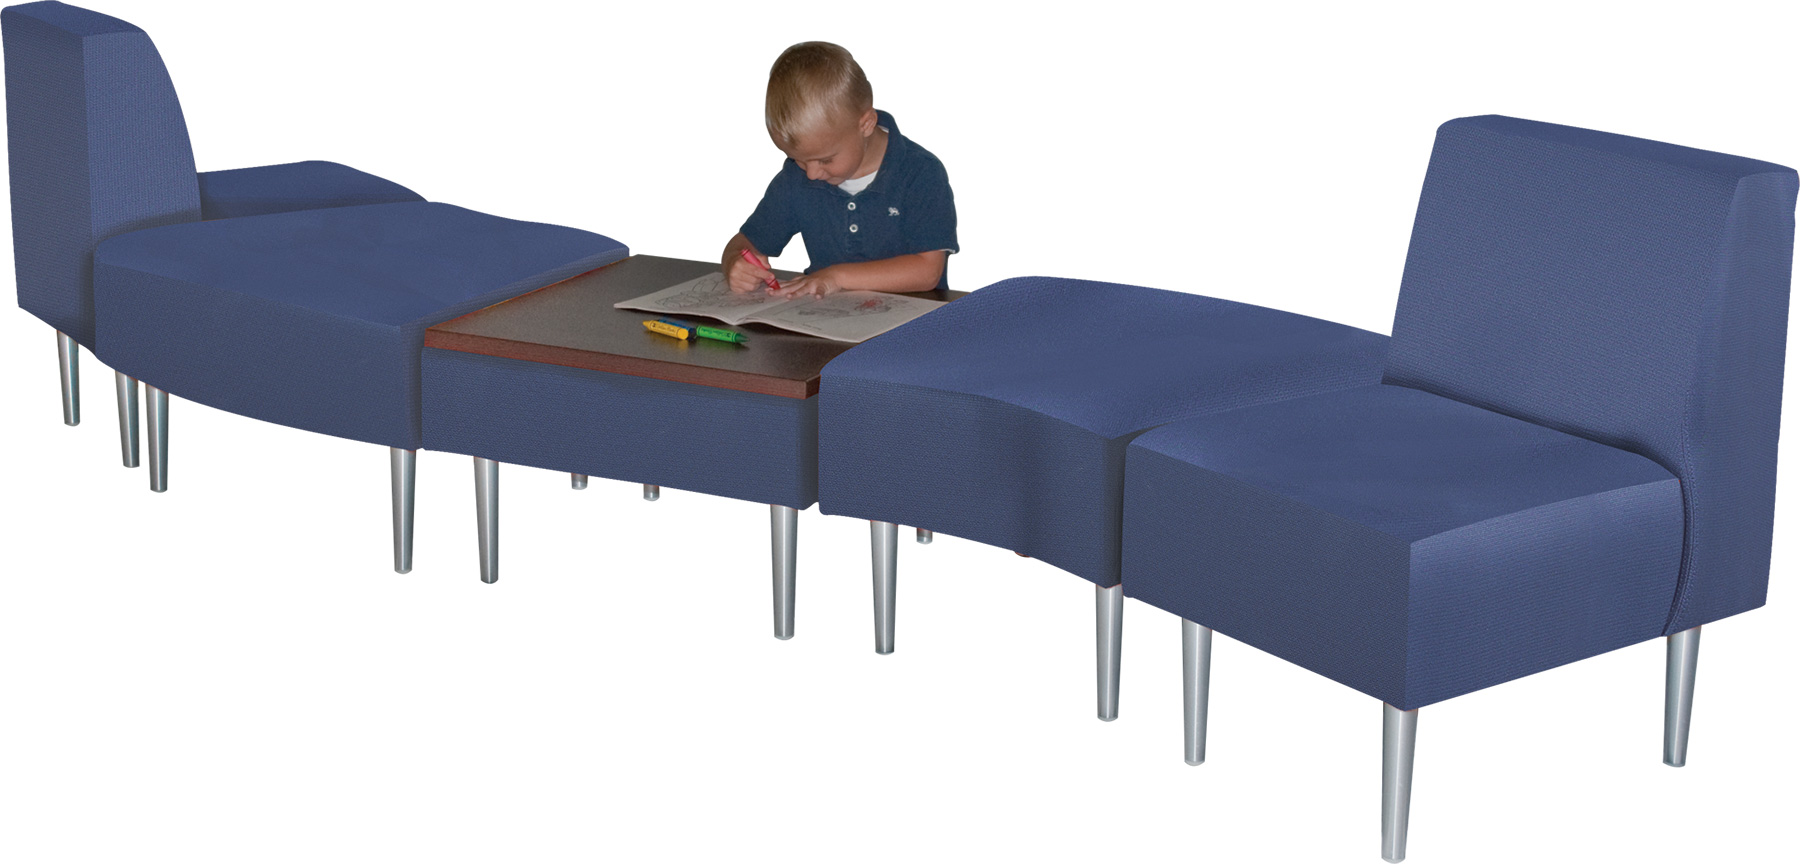 HPFI® Evette Curved Modular Lounge Seating